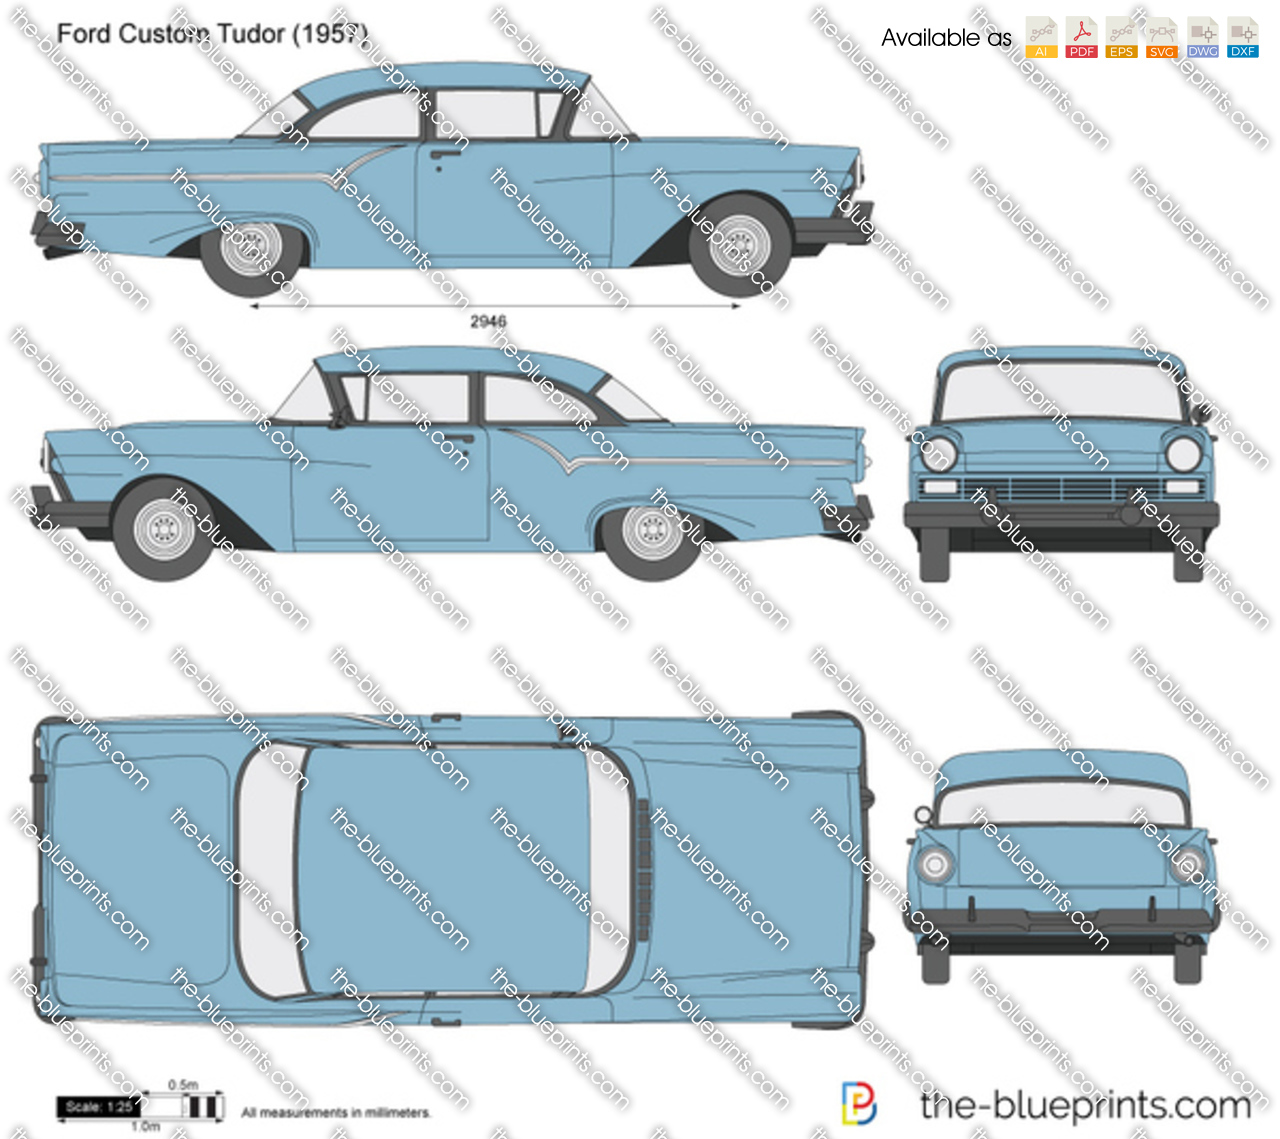 Ford Custom Tudor